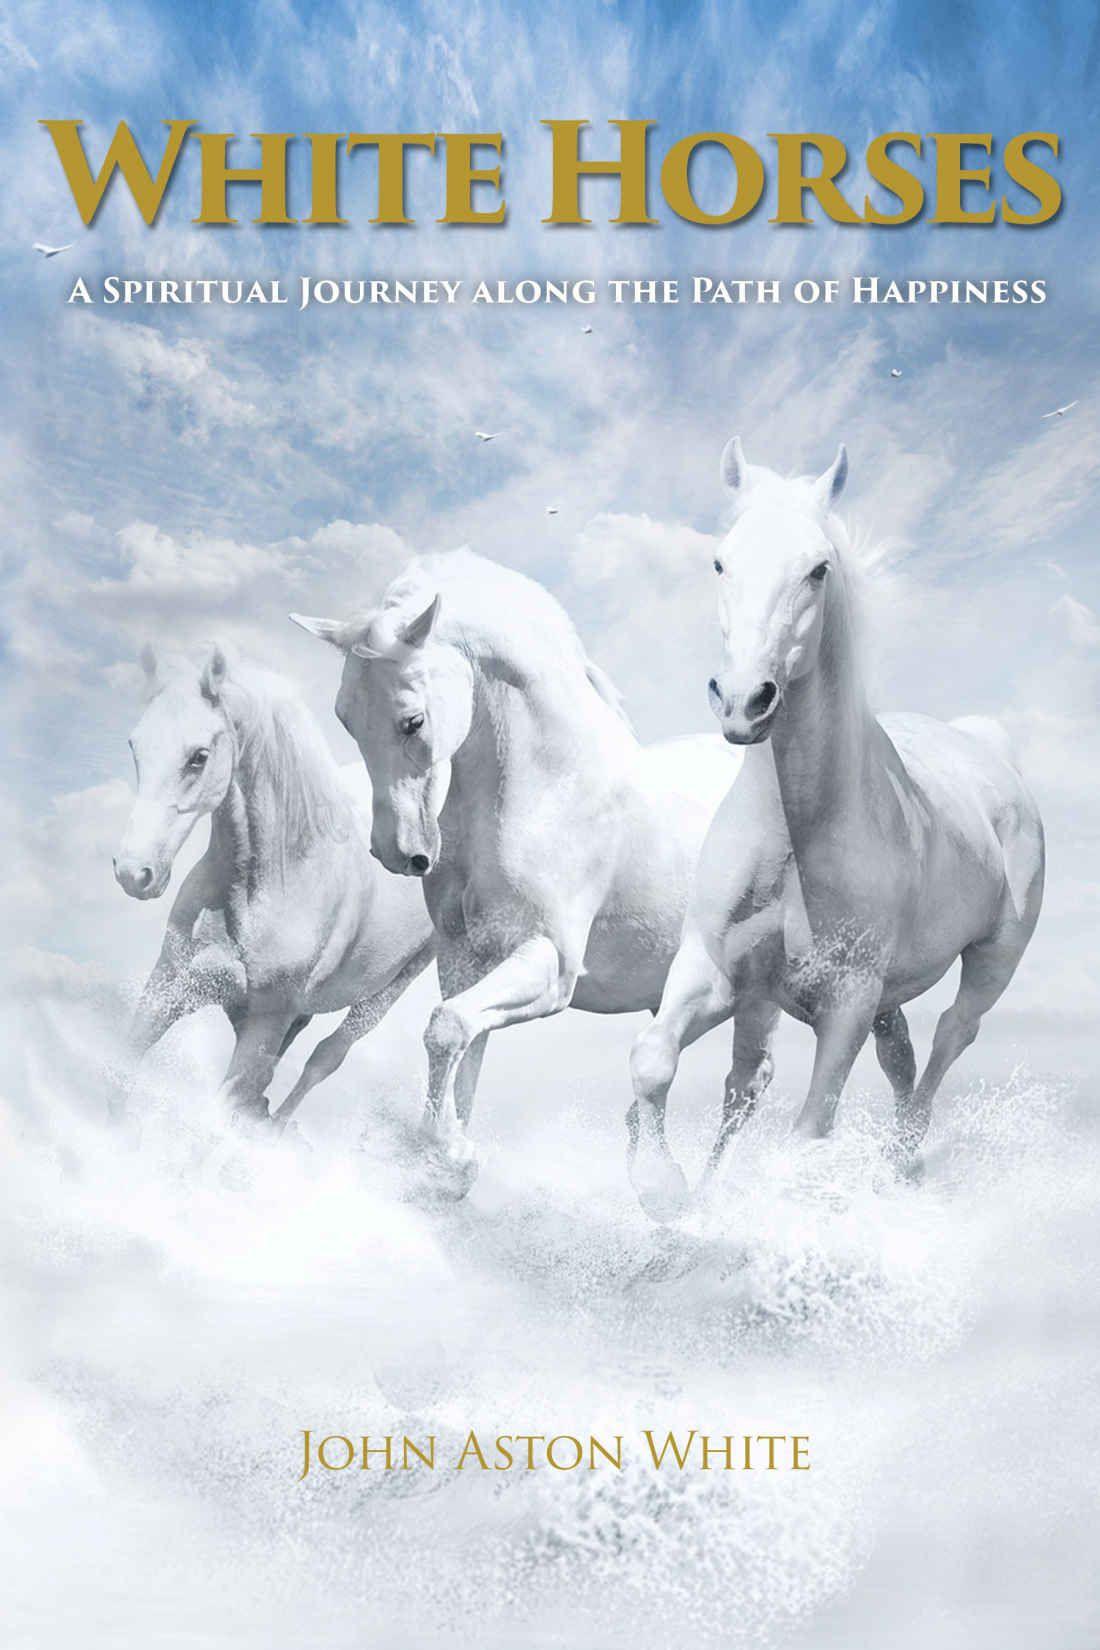 White Horses: A Spiritual Journey along the Path of Happiness - Kindle  edition by John Aston White. Religion & Spirituality Kindle eBooks @  Amazon.com.